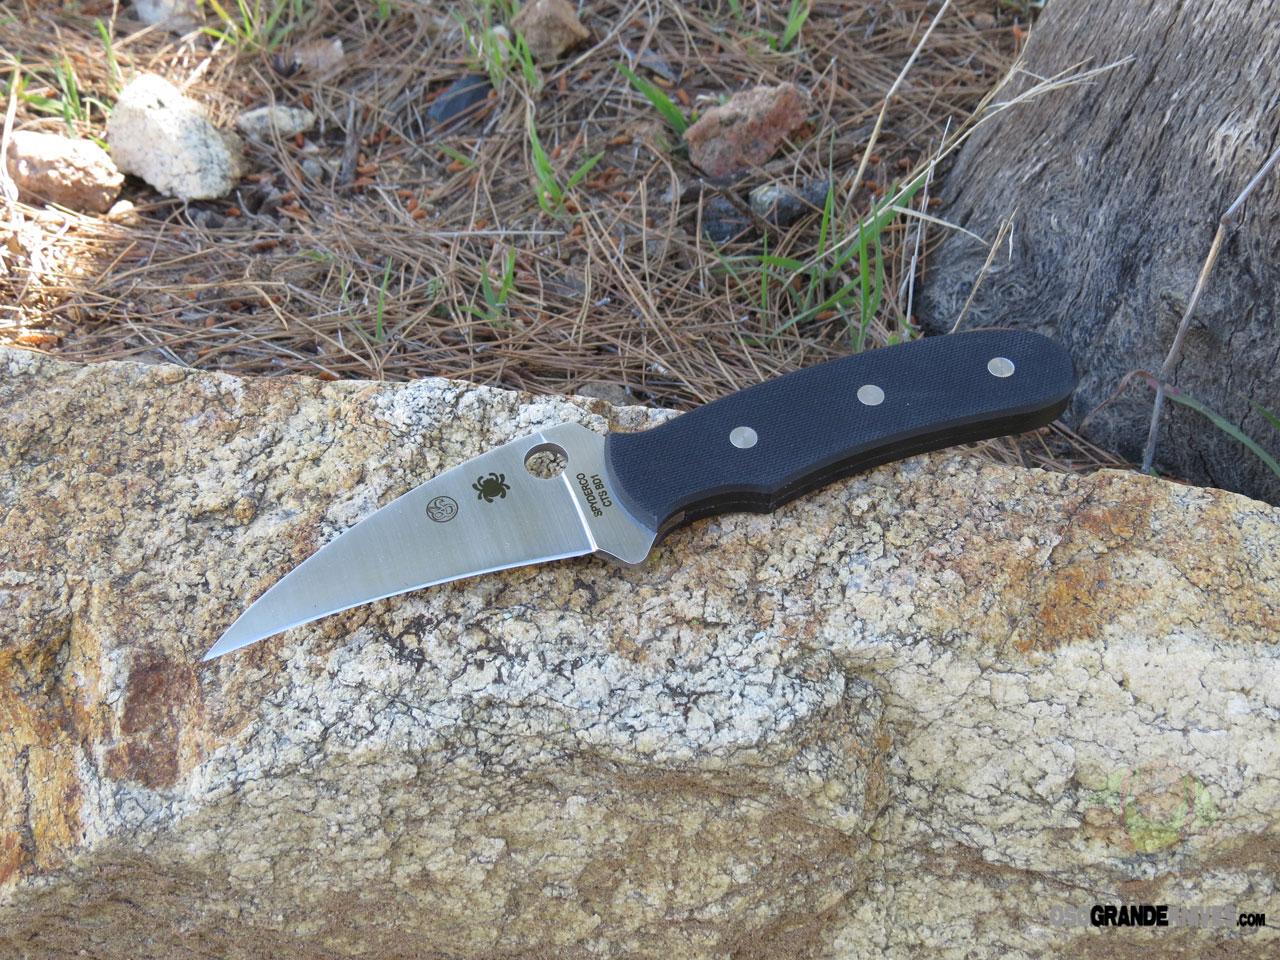 Spyderco Reverse Fixed Blade Knife G 10 3 5 Inch Blade